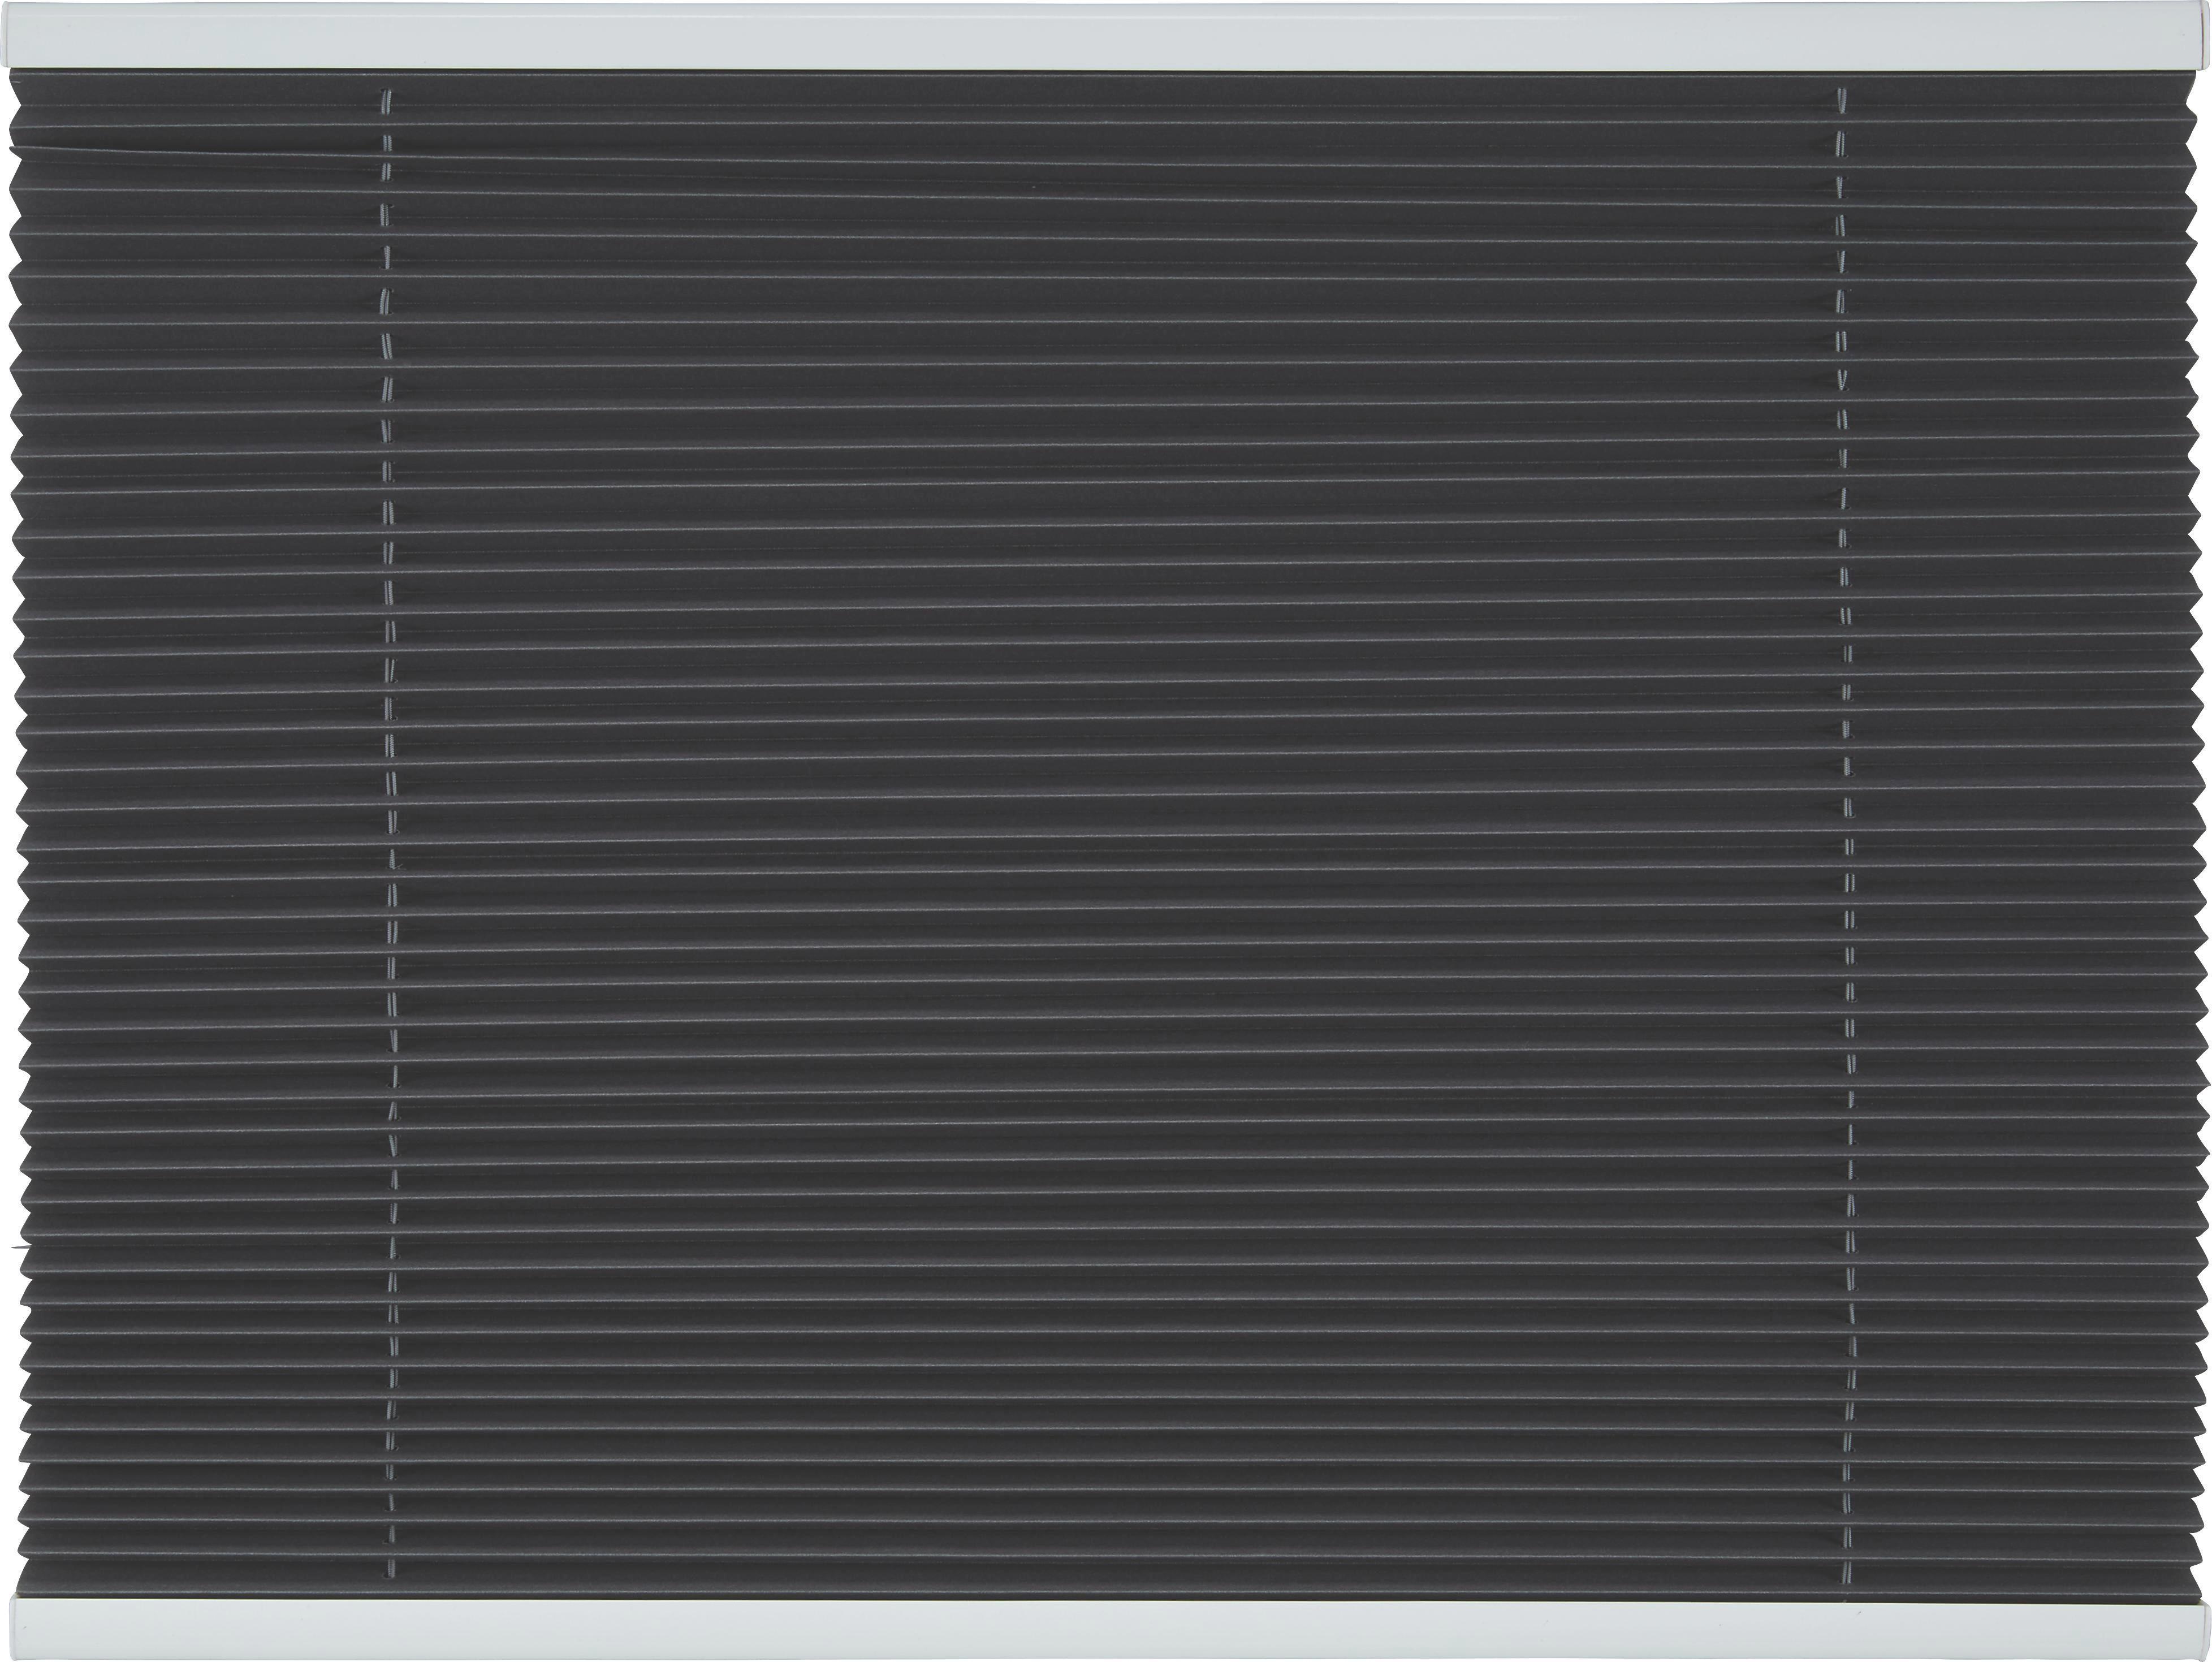 Harmonika Roló Antracit - antracit, textil (60/130cm) - MÖMAX modern living